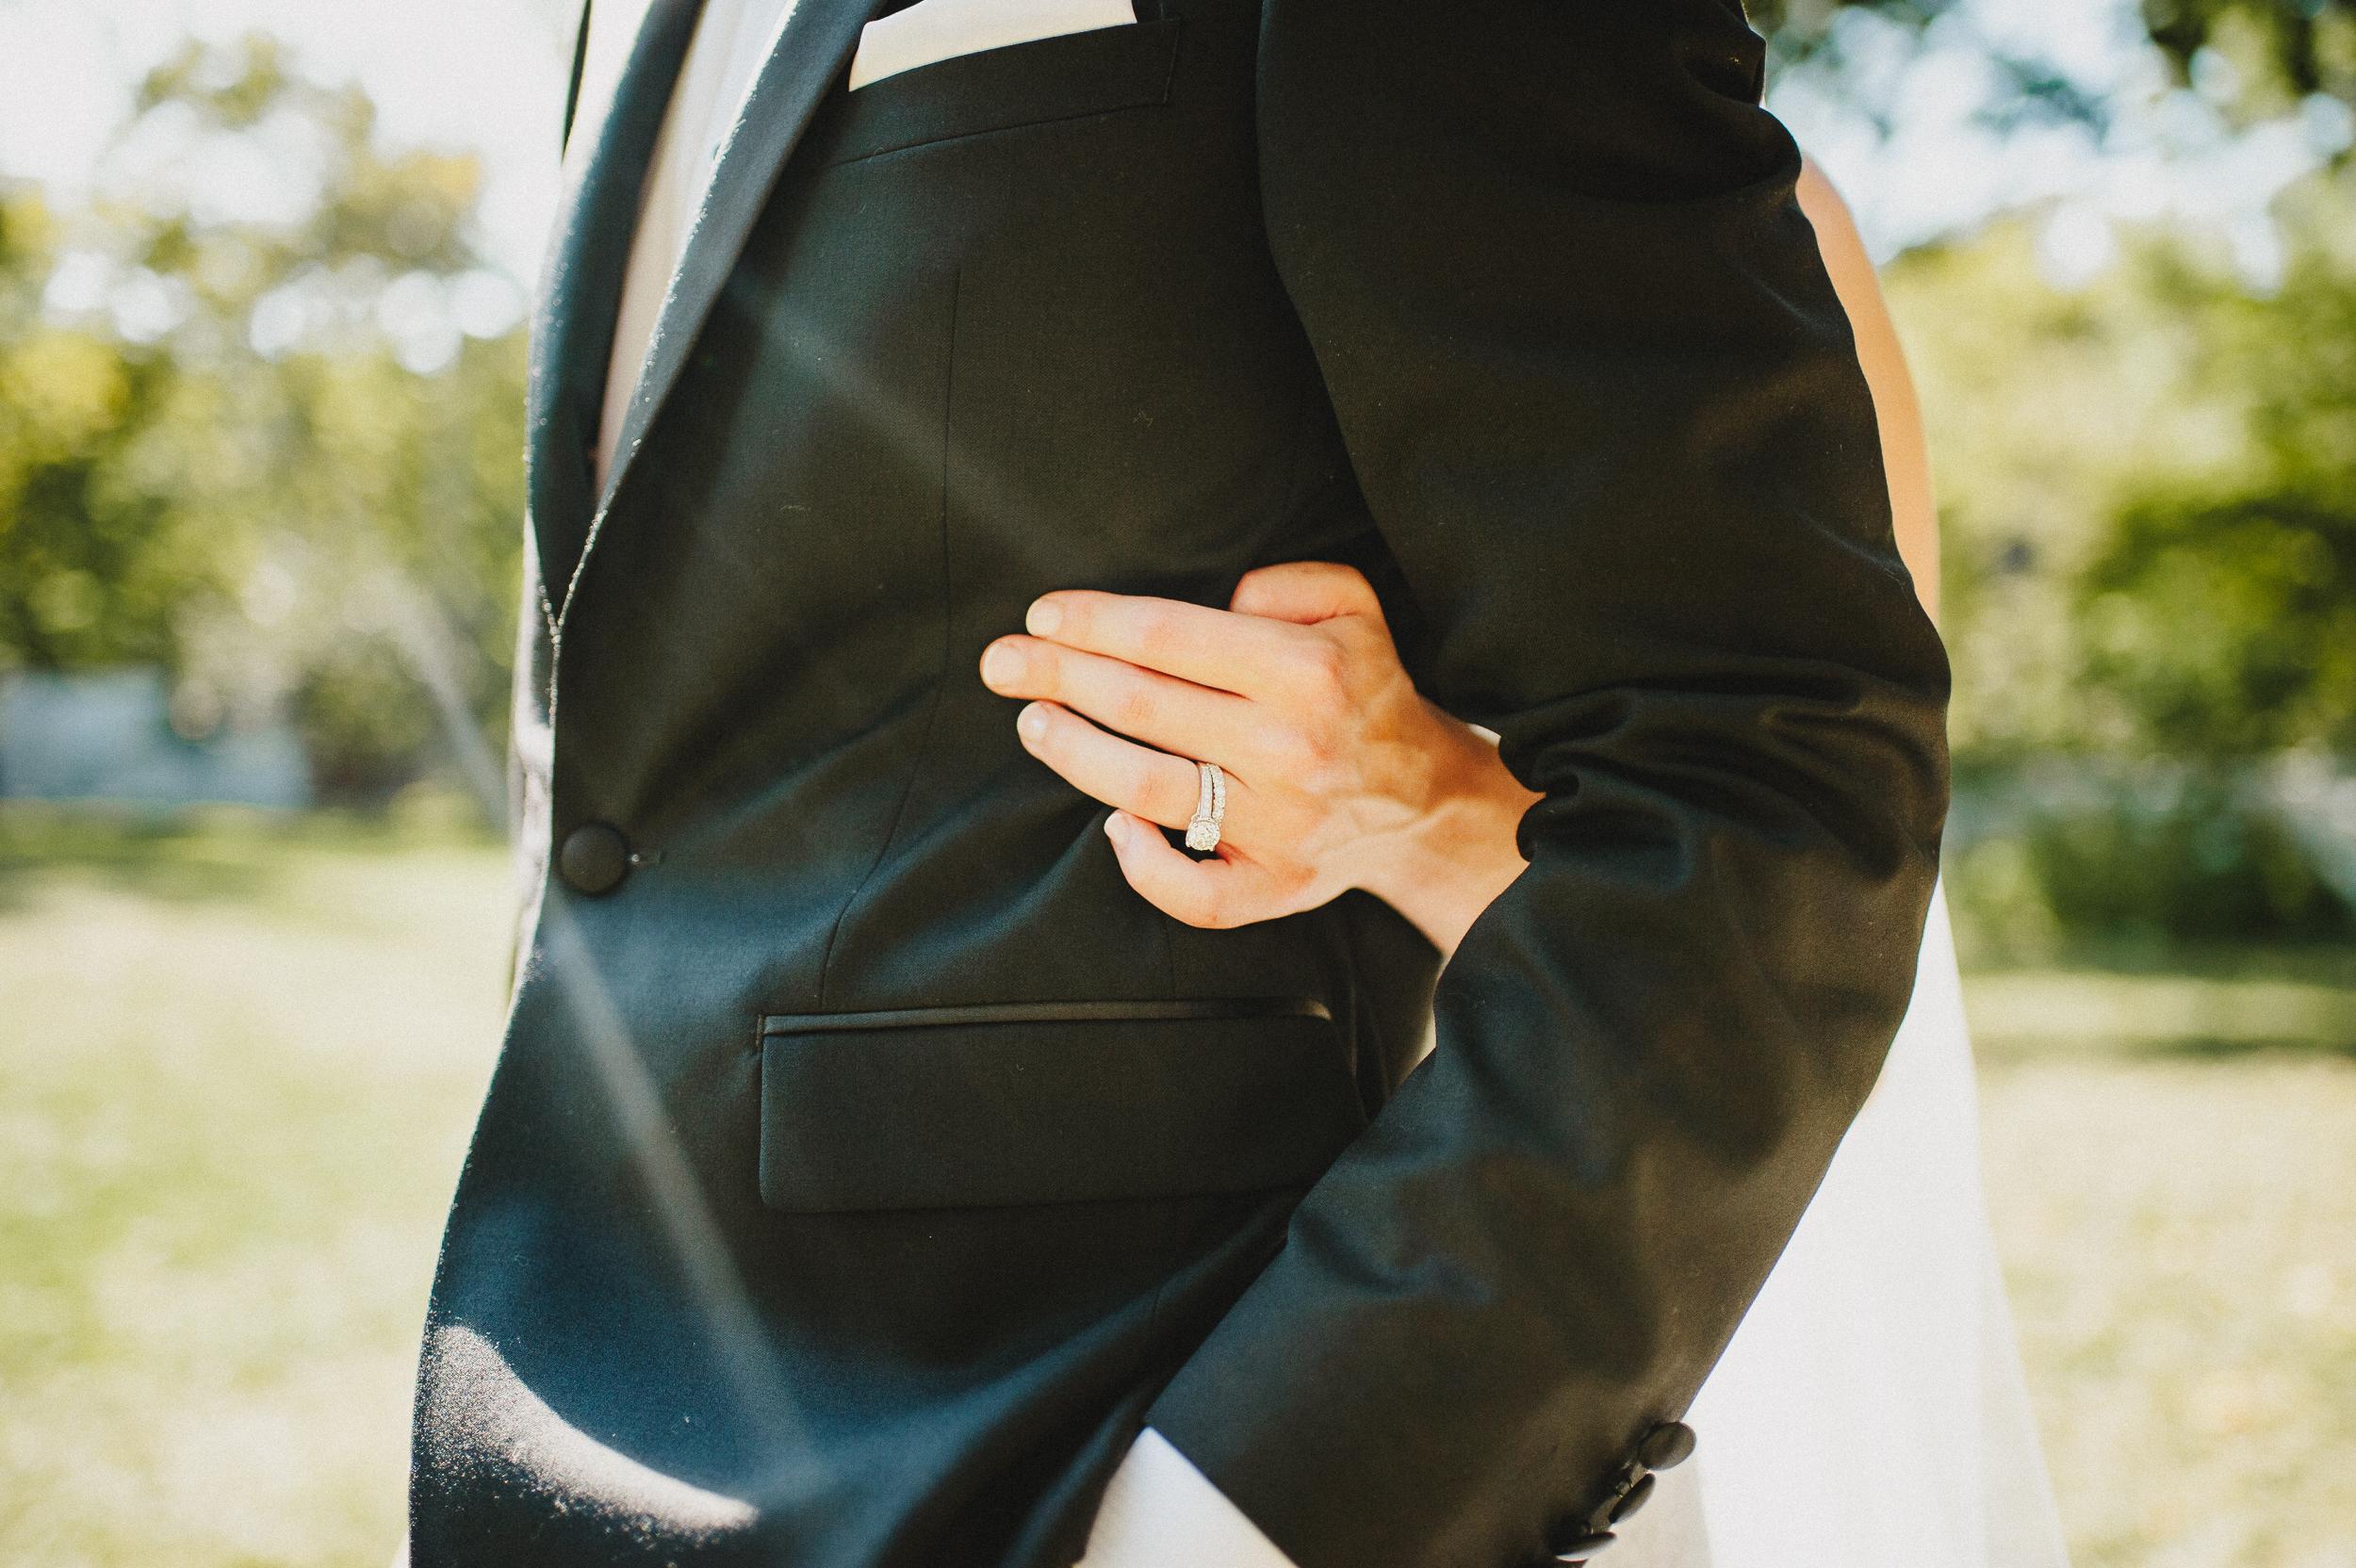 ritz-philly-philadelphia-wedding-photographer-59.jpg